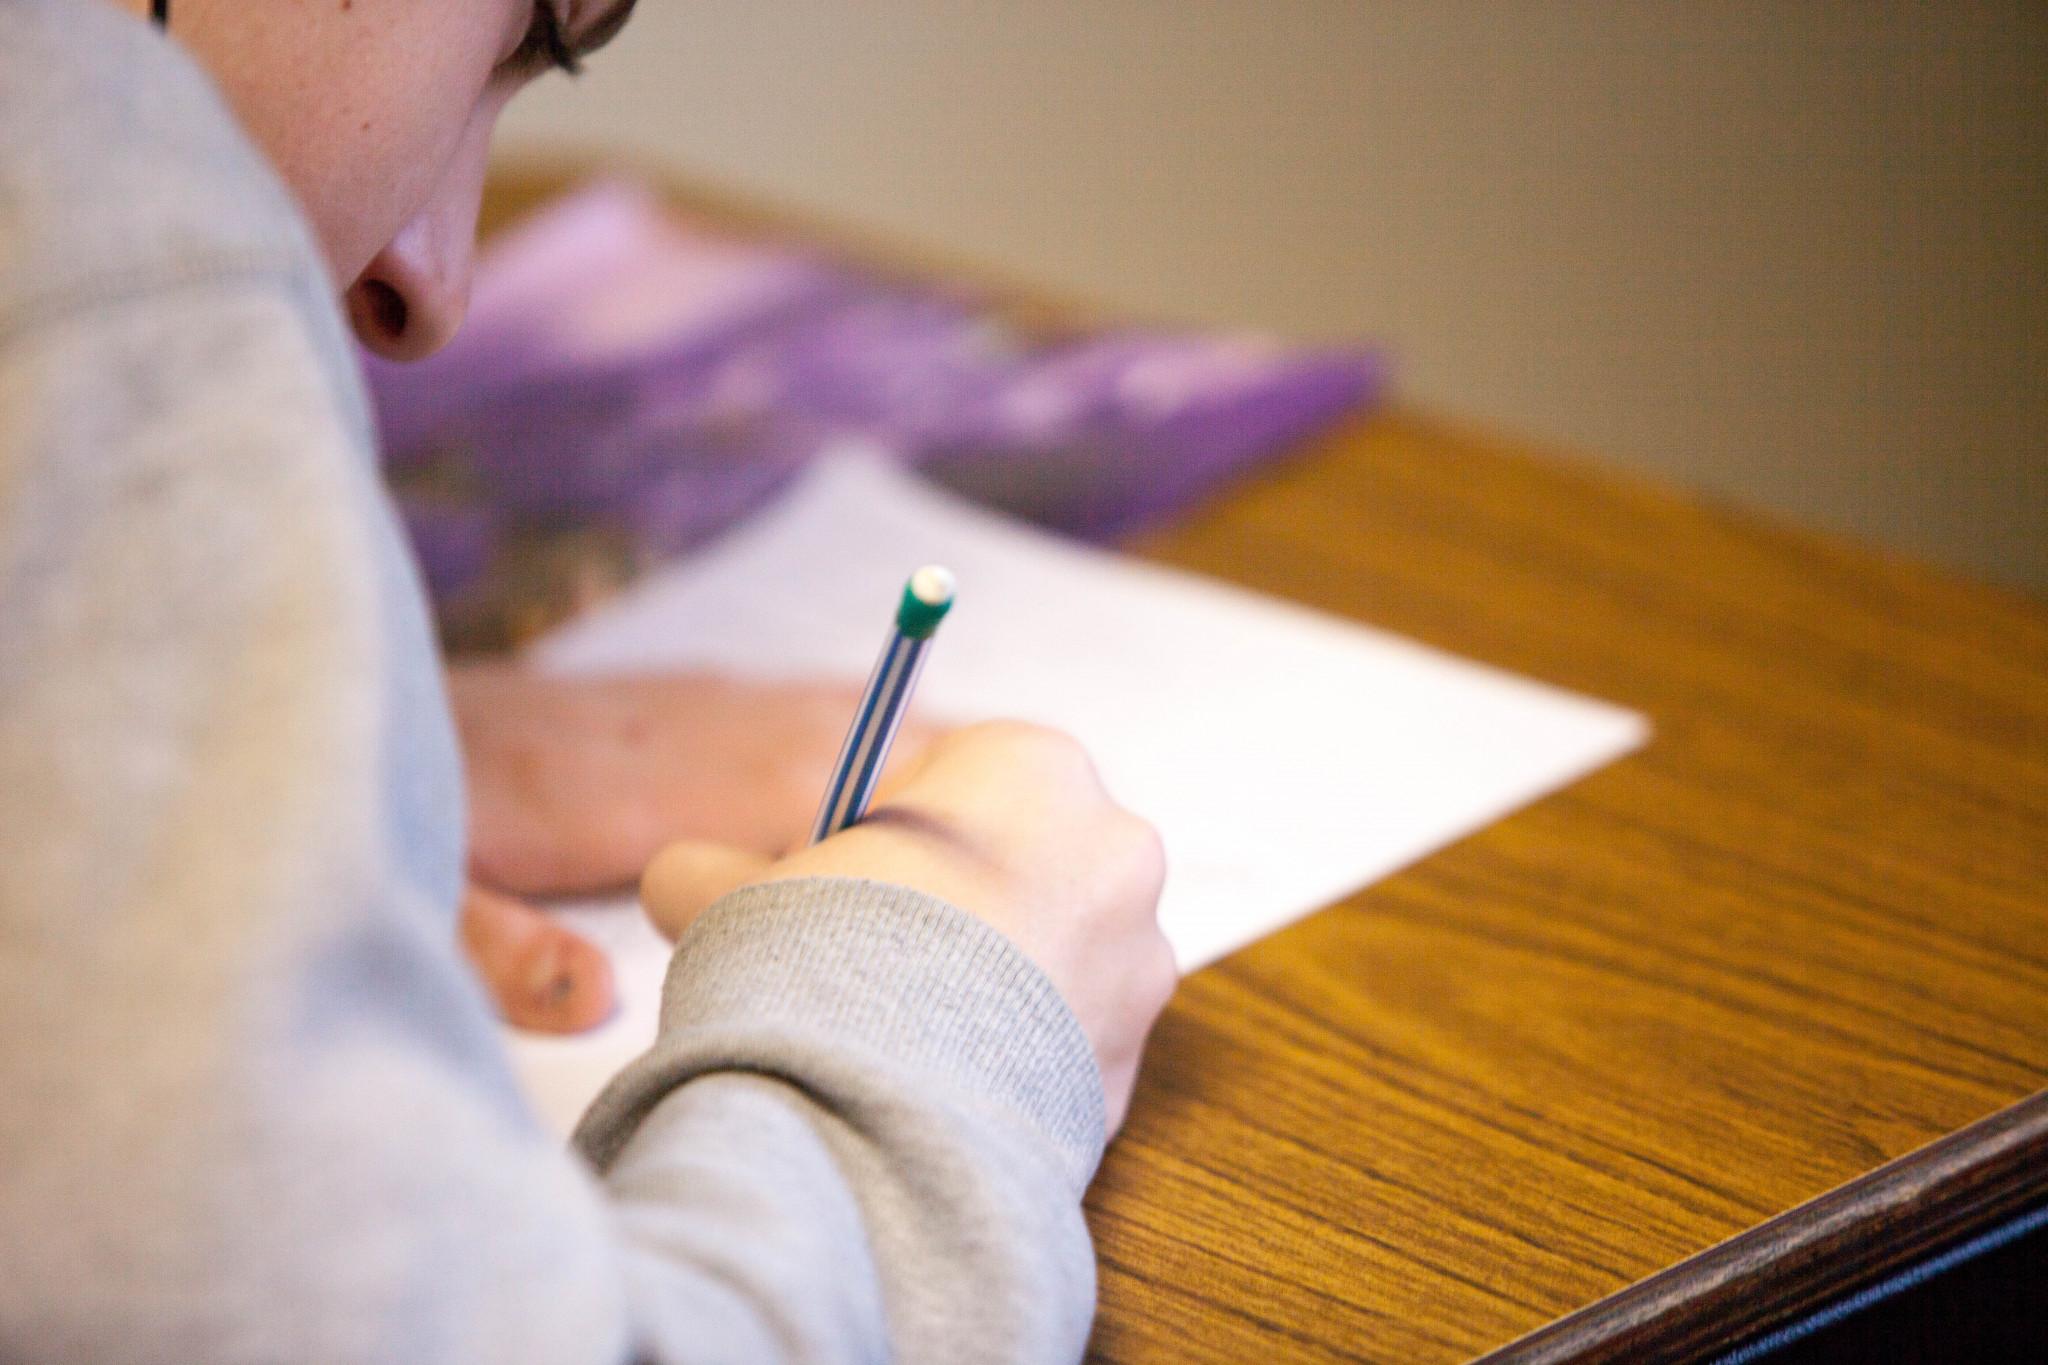 Ung elever sittandes koncentrerad vid skolbänk.